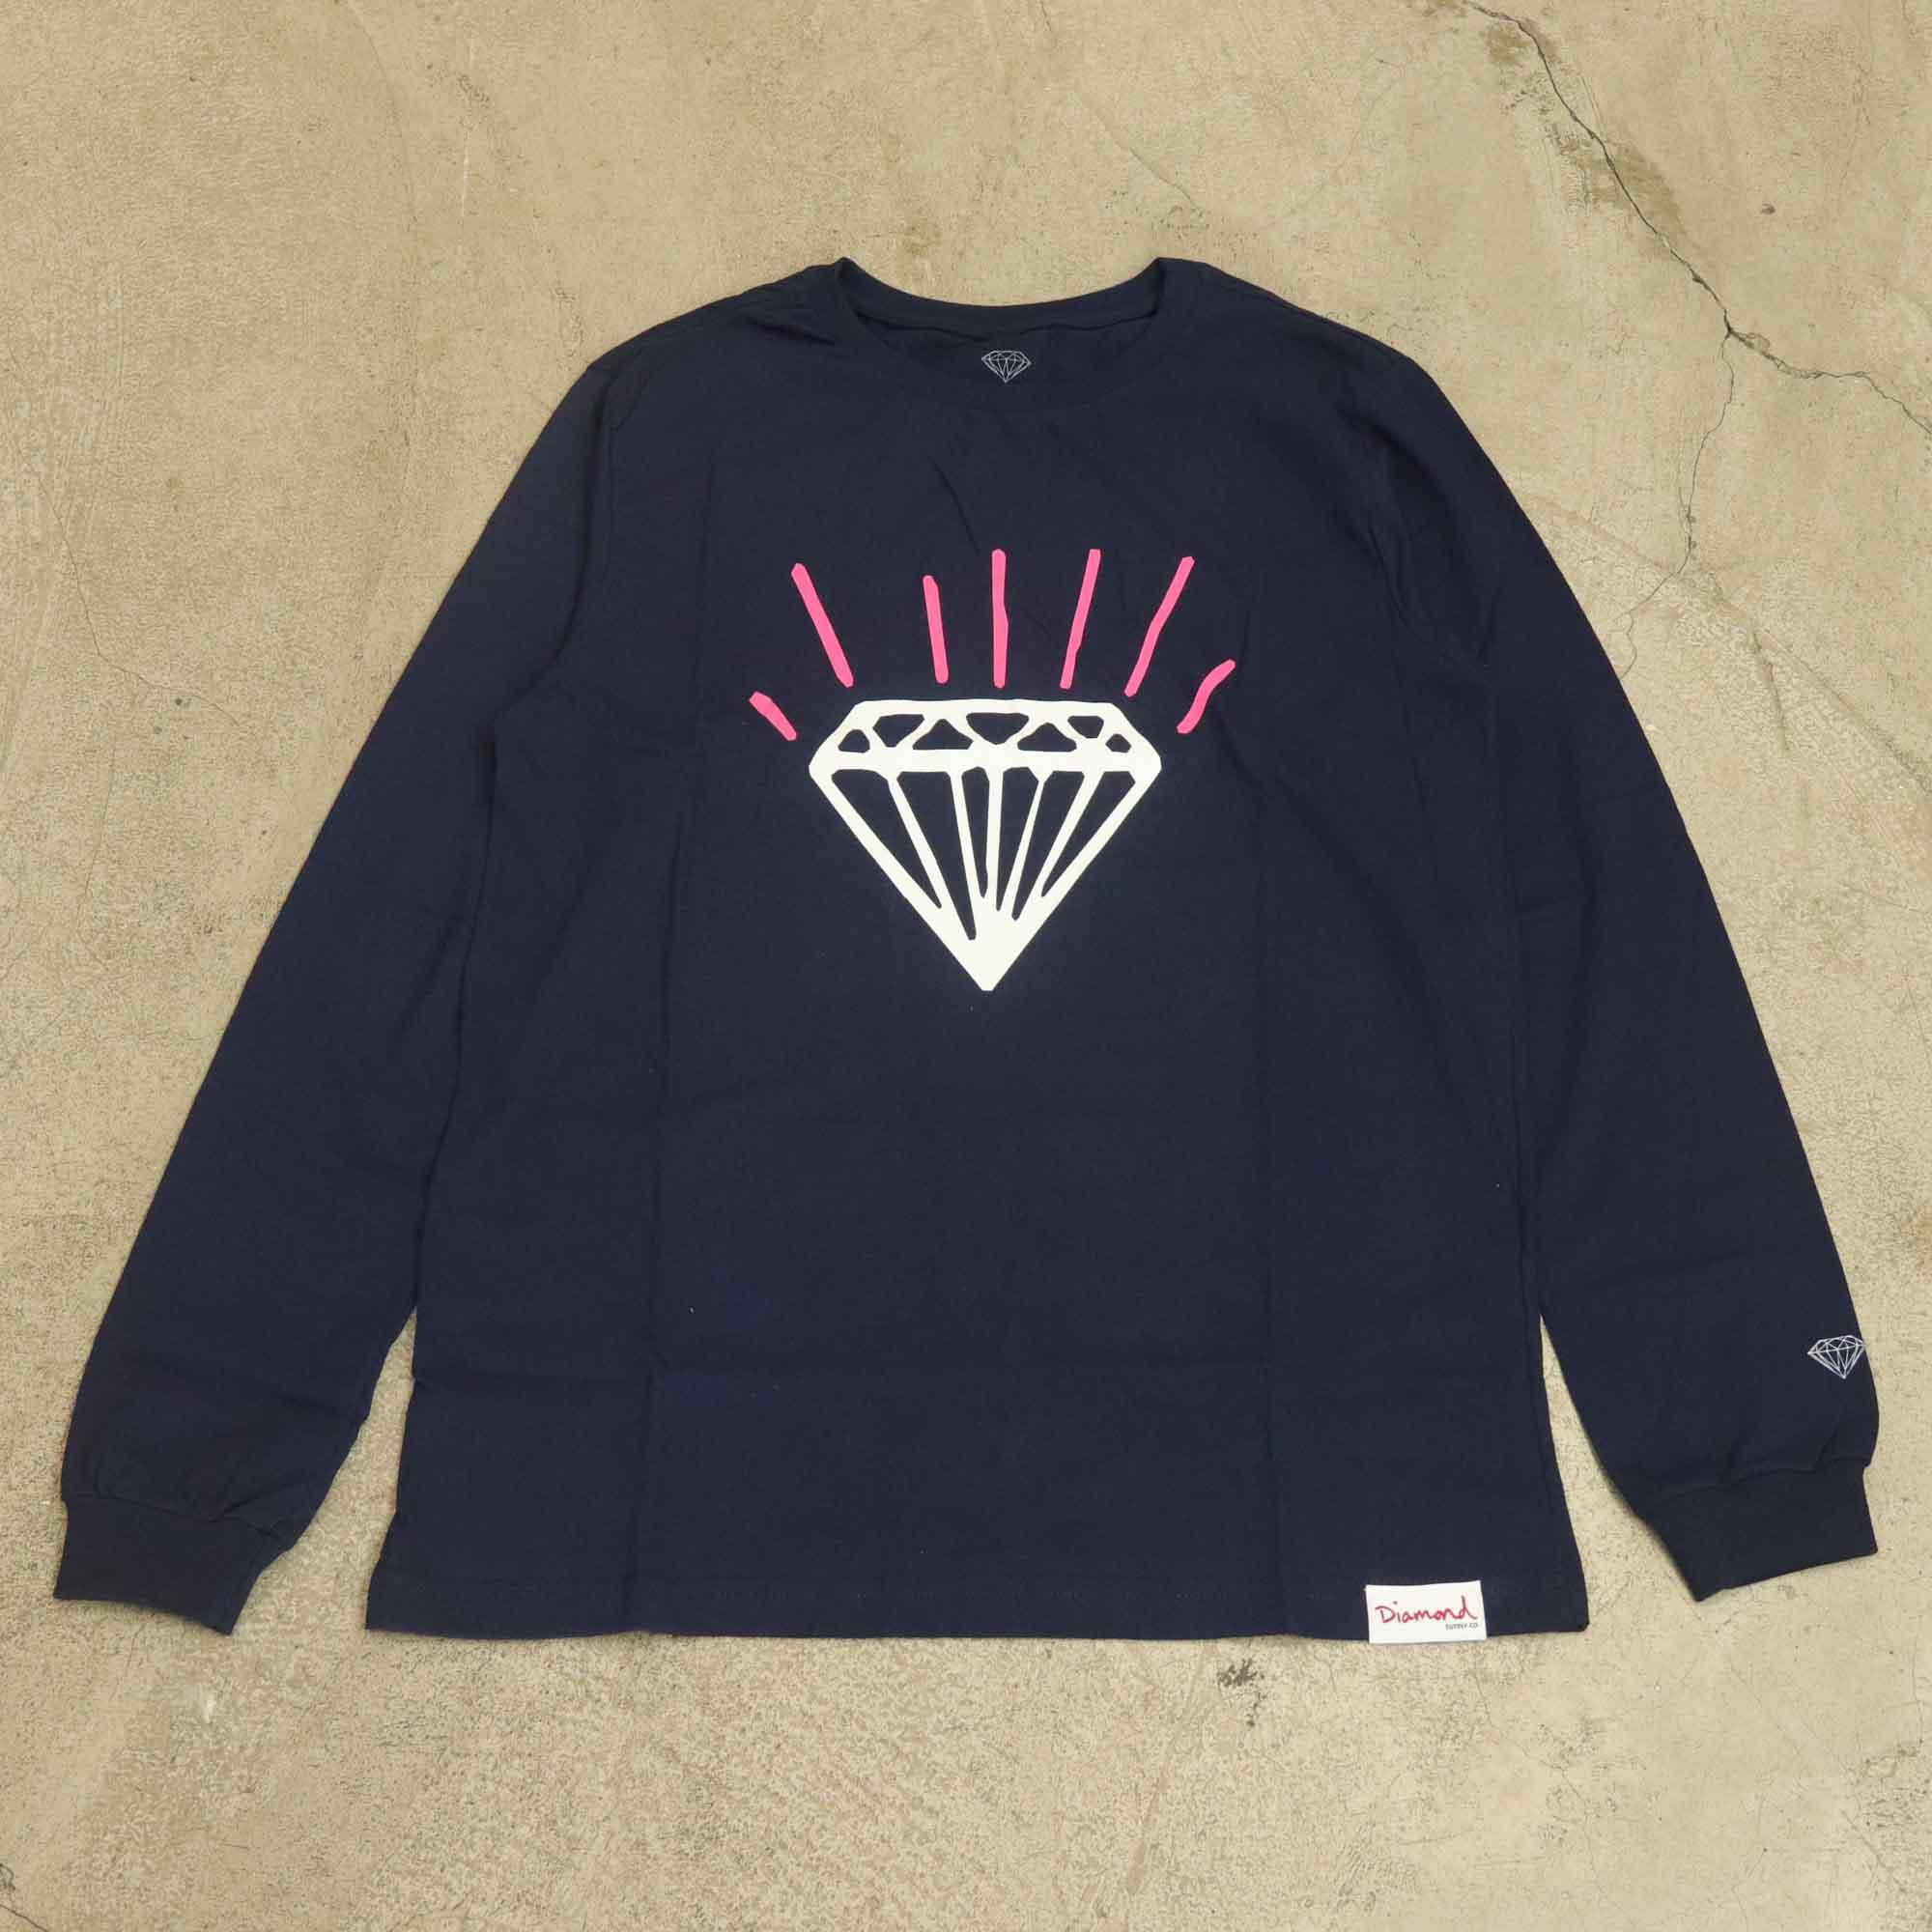 Camiseta Diamond Manga Longa